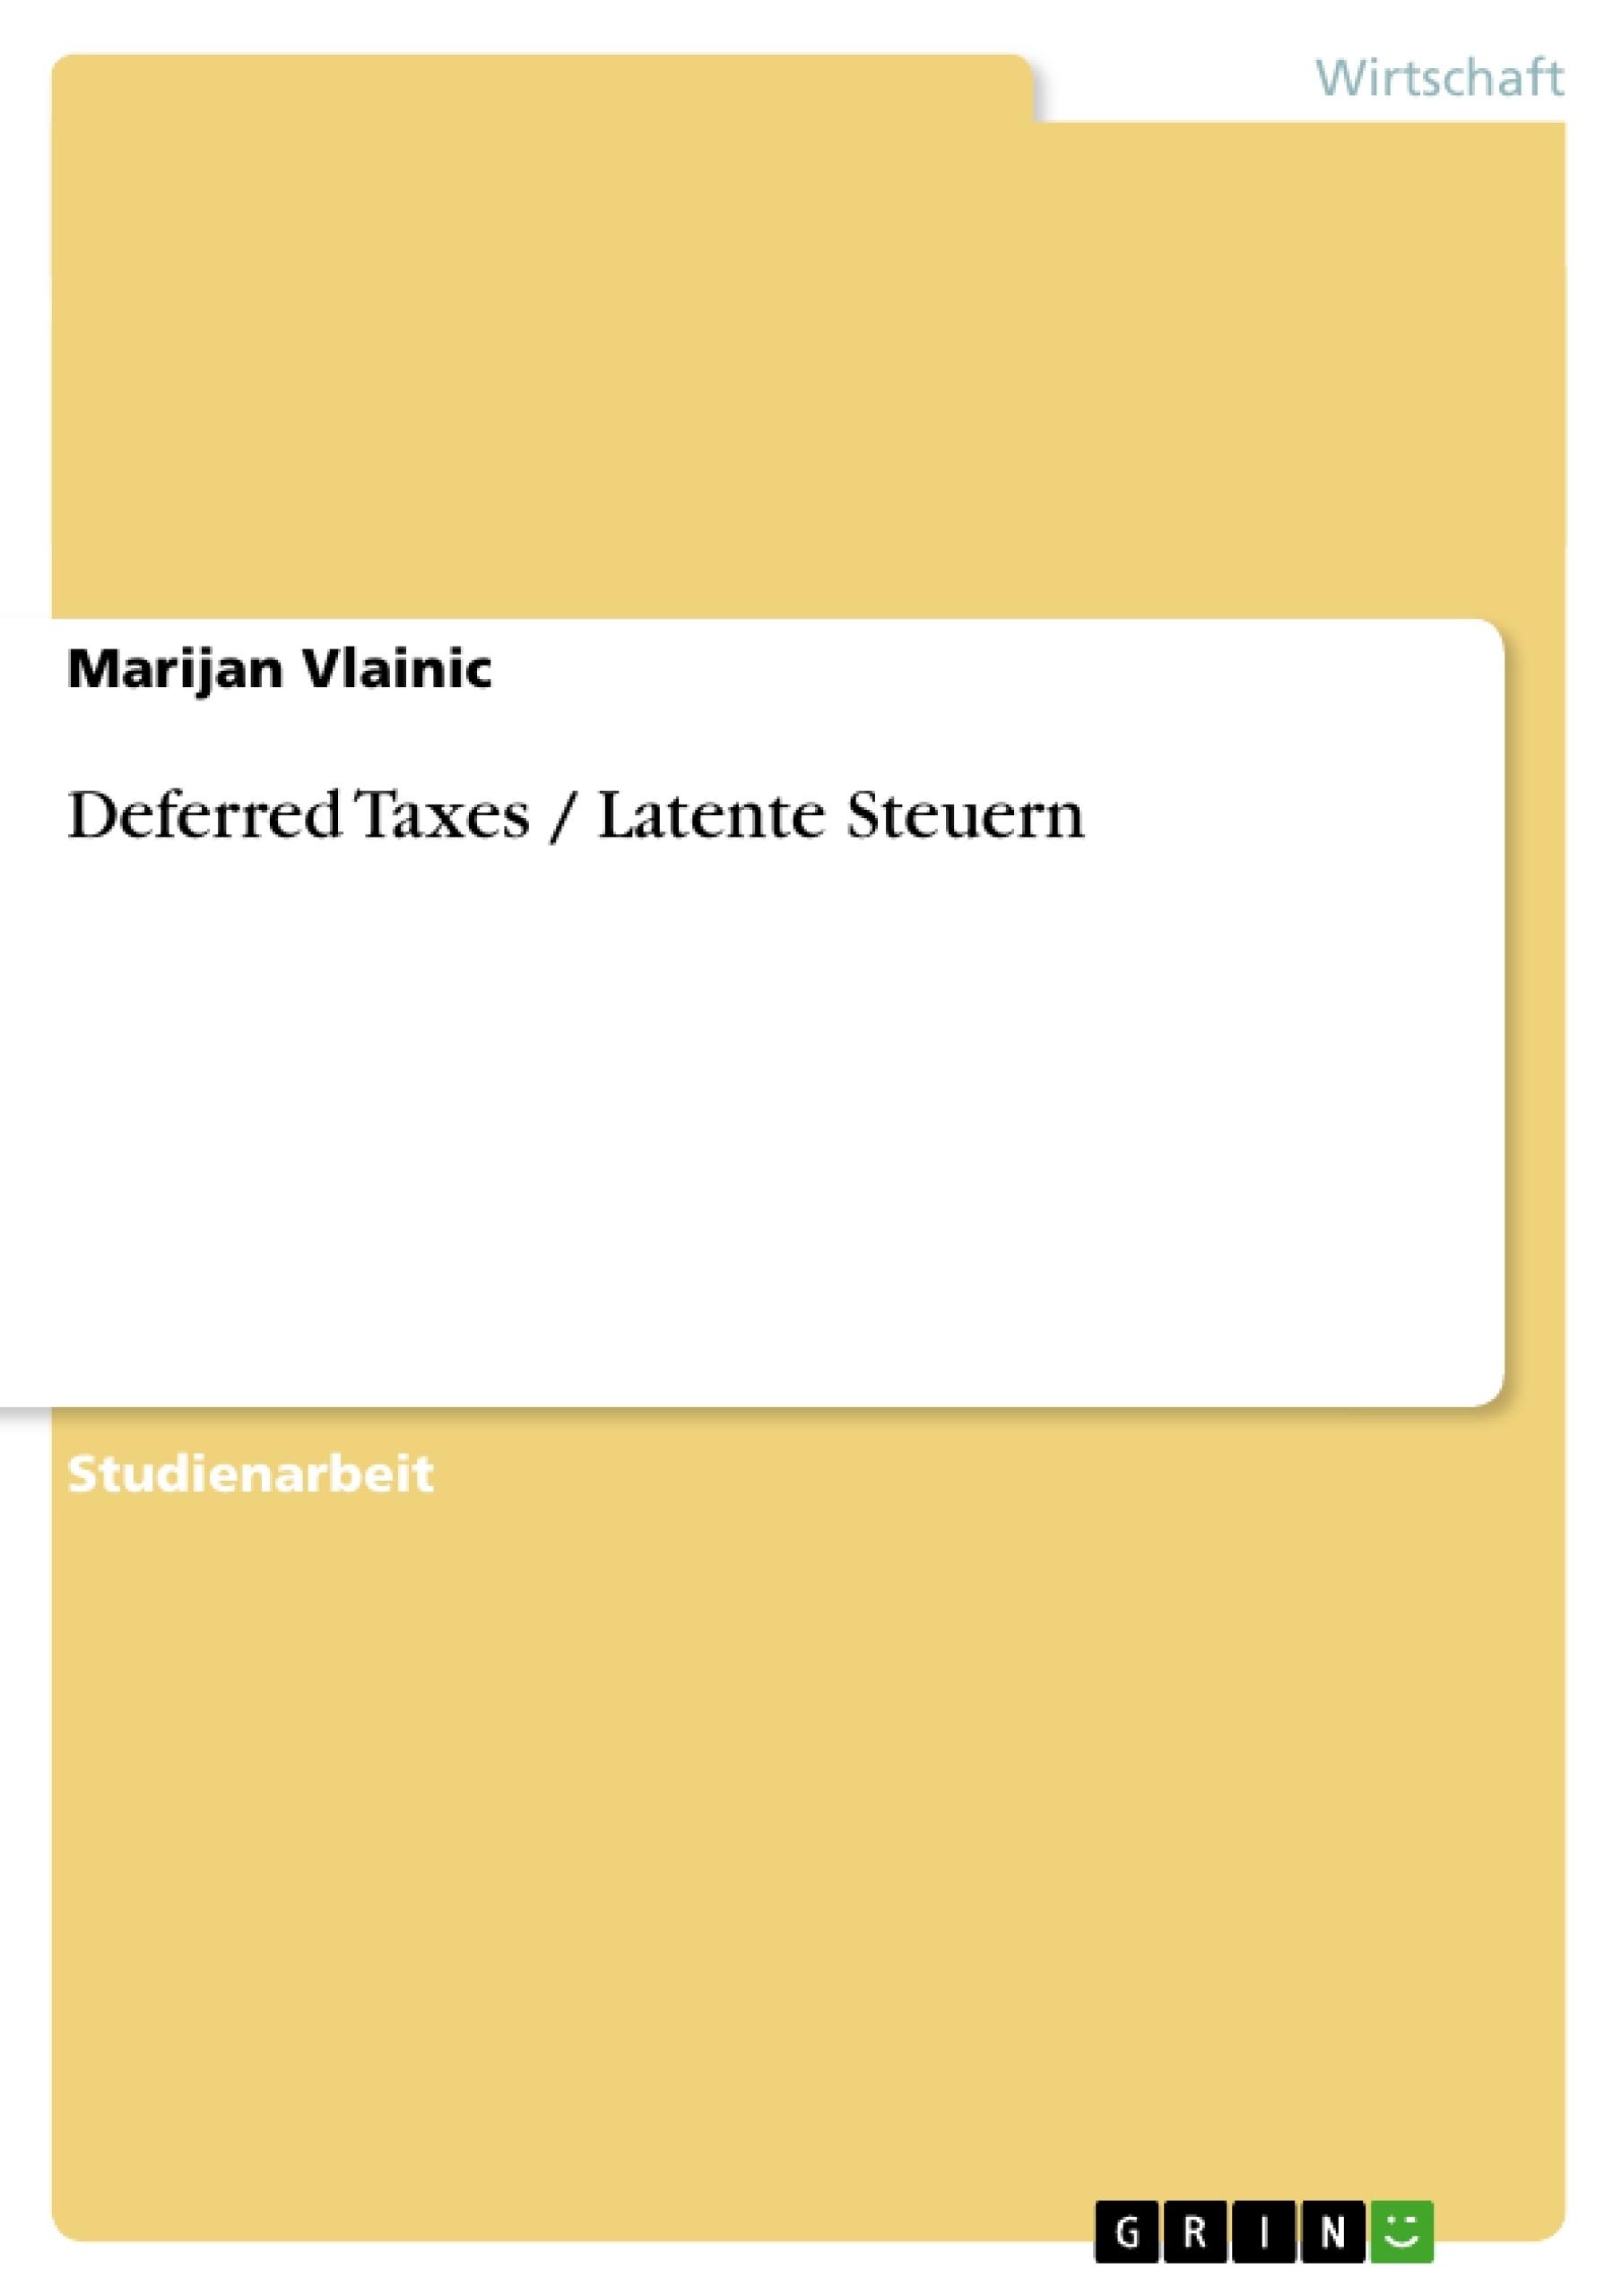 Titel: Deferred Taxes / Latente Steuern